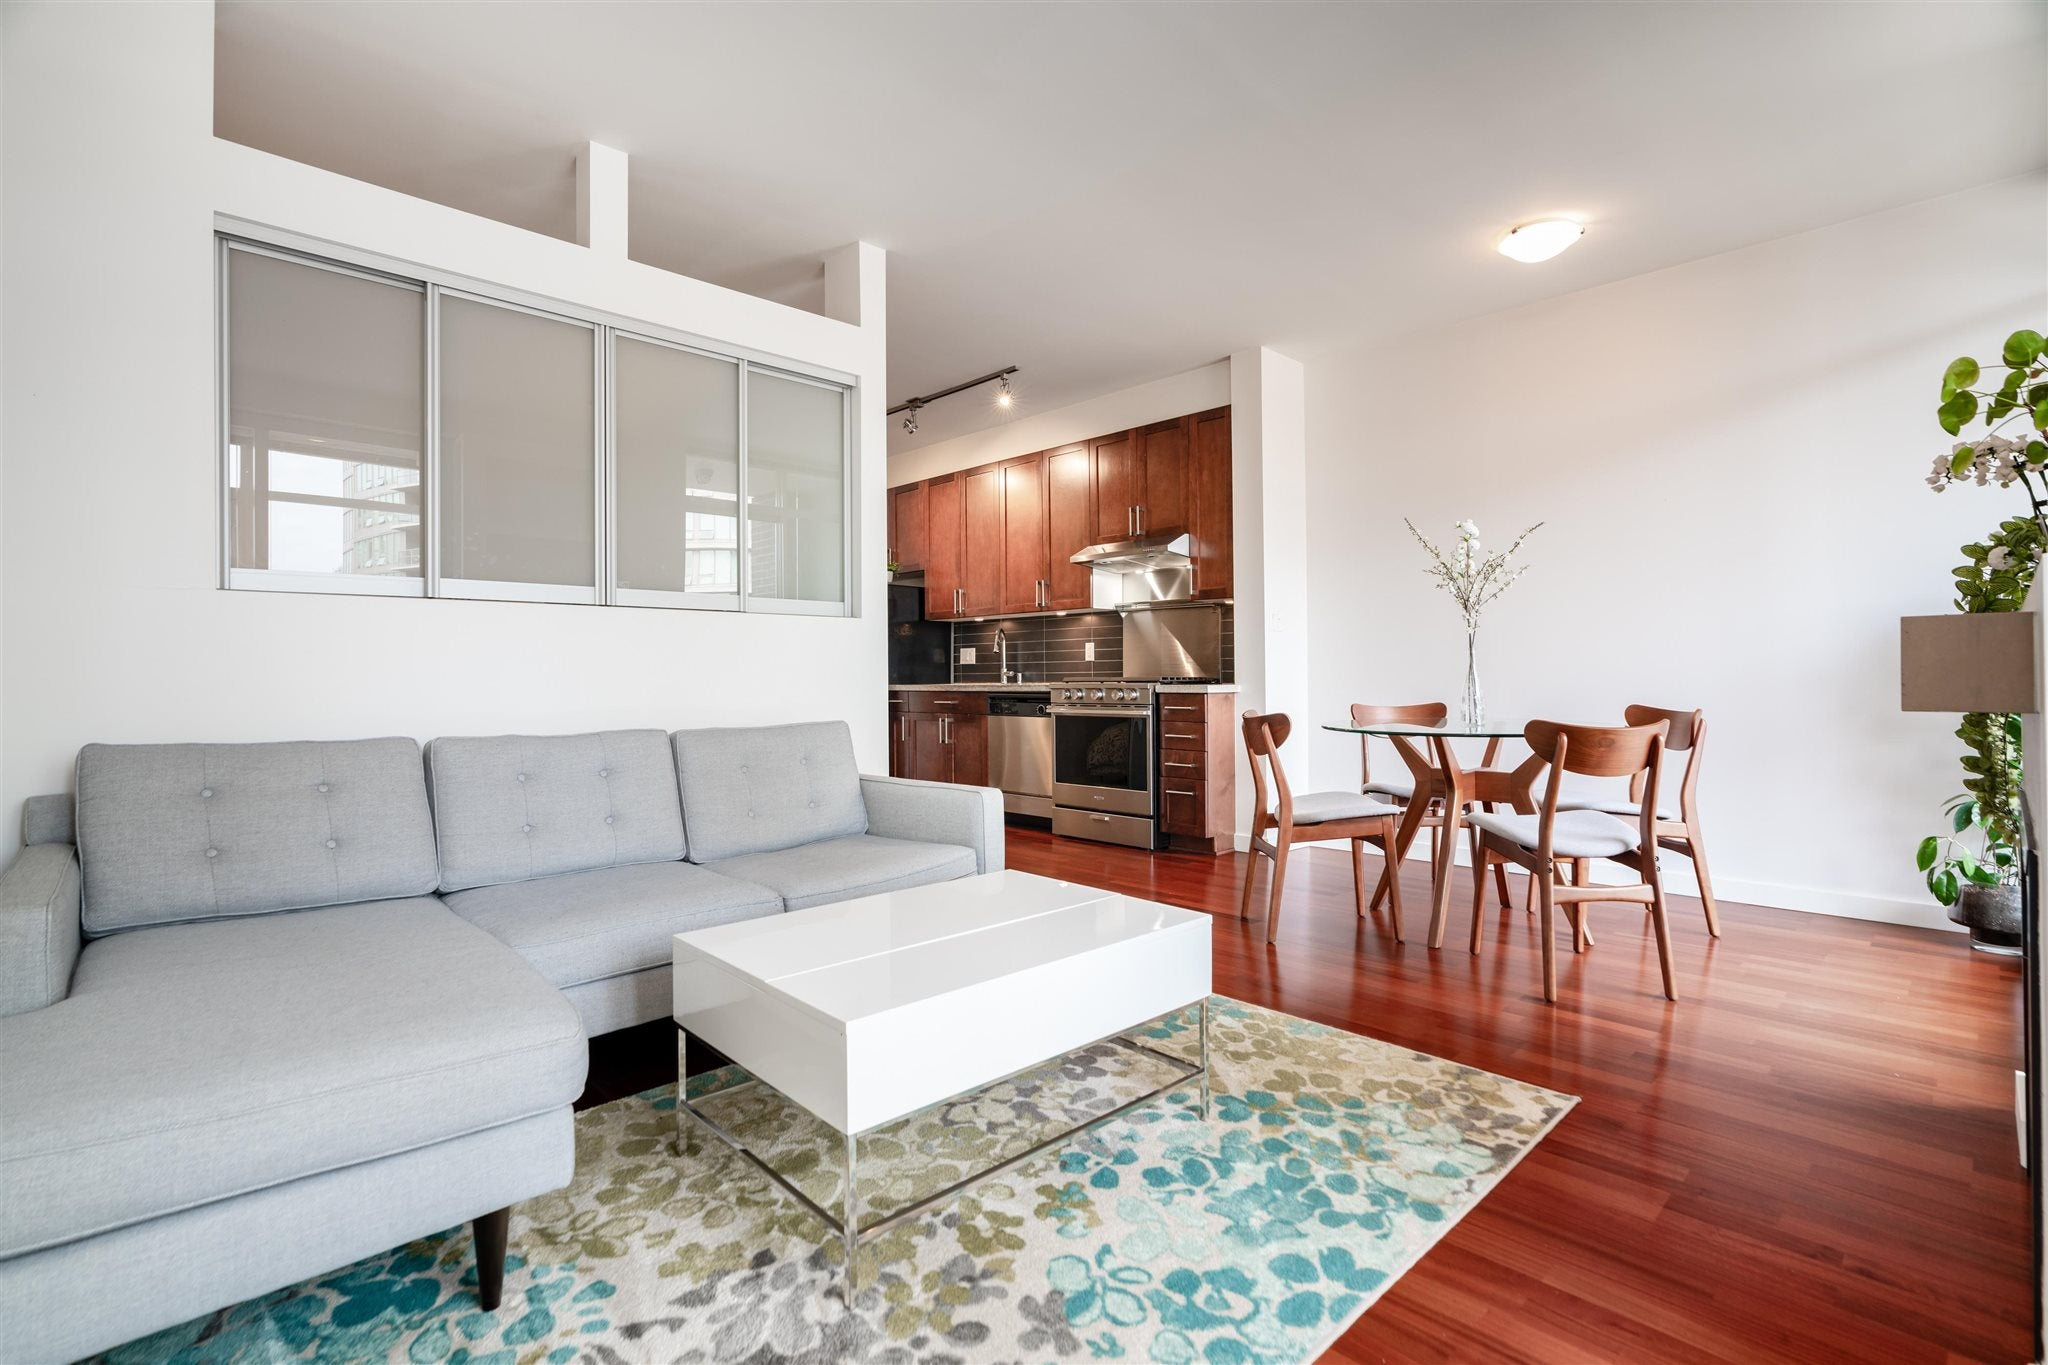 306 2055 YUKON STREET - False Creek Apartment/Condo for sale, 1 Bedroom (R2601430) - #1